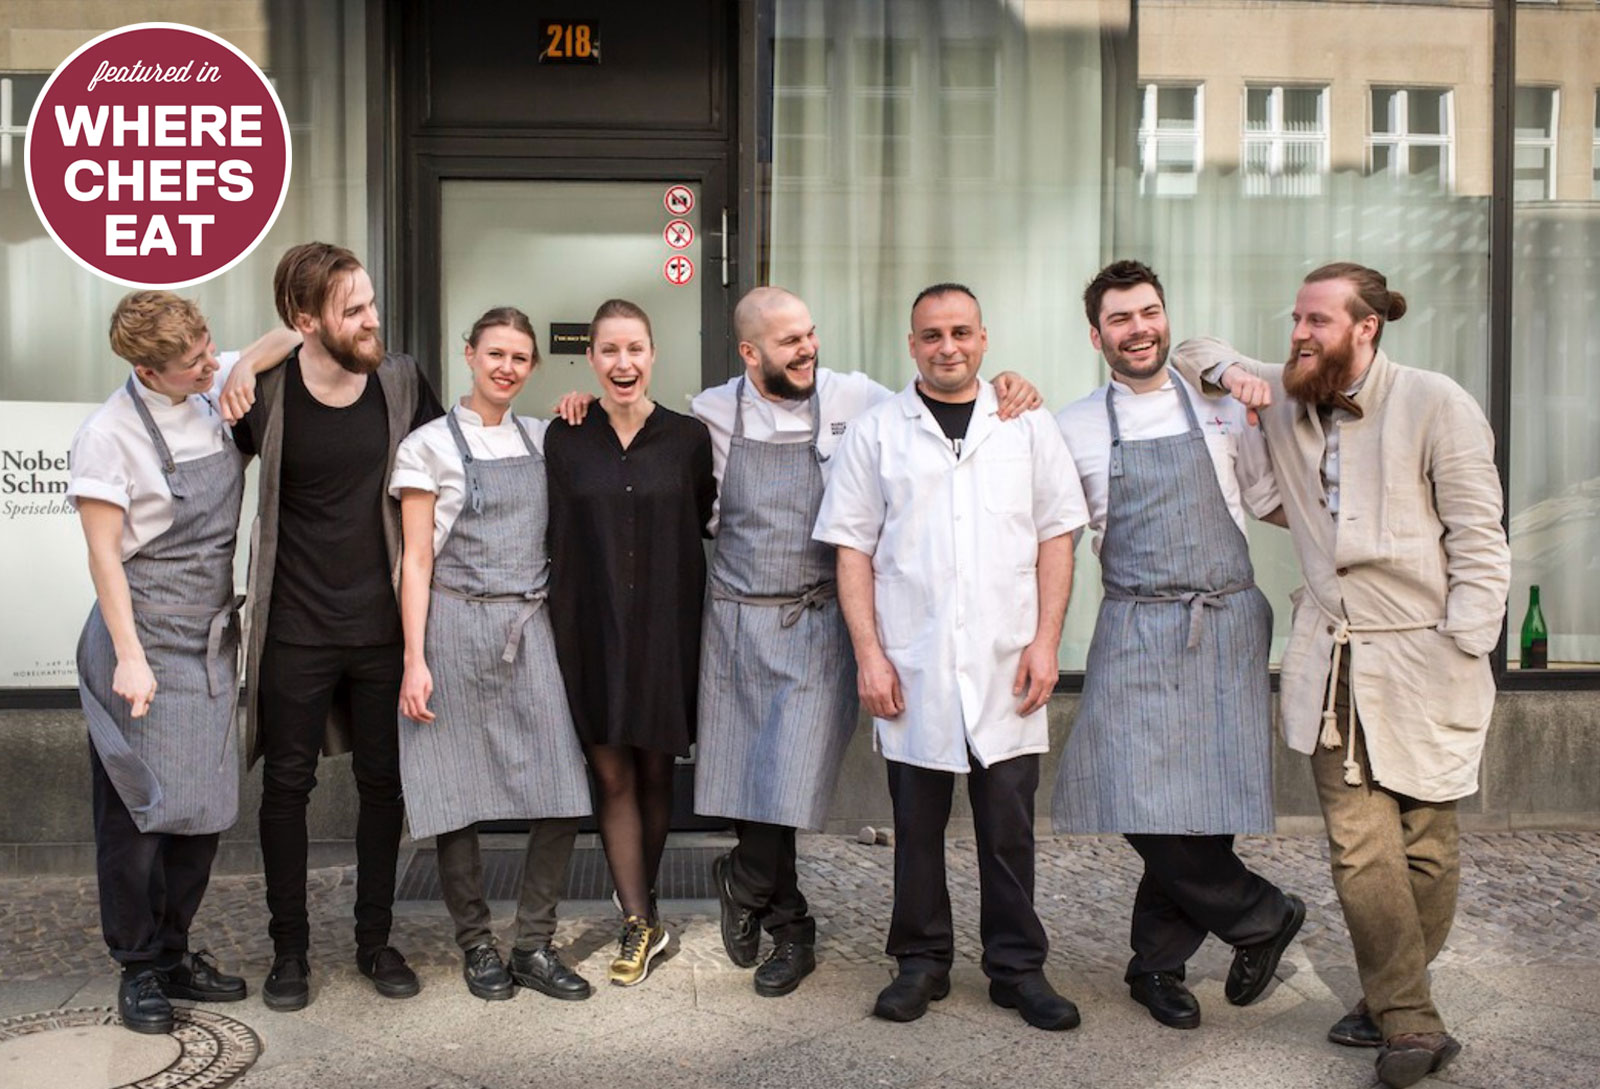 Th team behind (or rather in front of) Nobelhart & Schmutzig - photo by Caroline Prange courtesy Nobelhart & Schmutzig